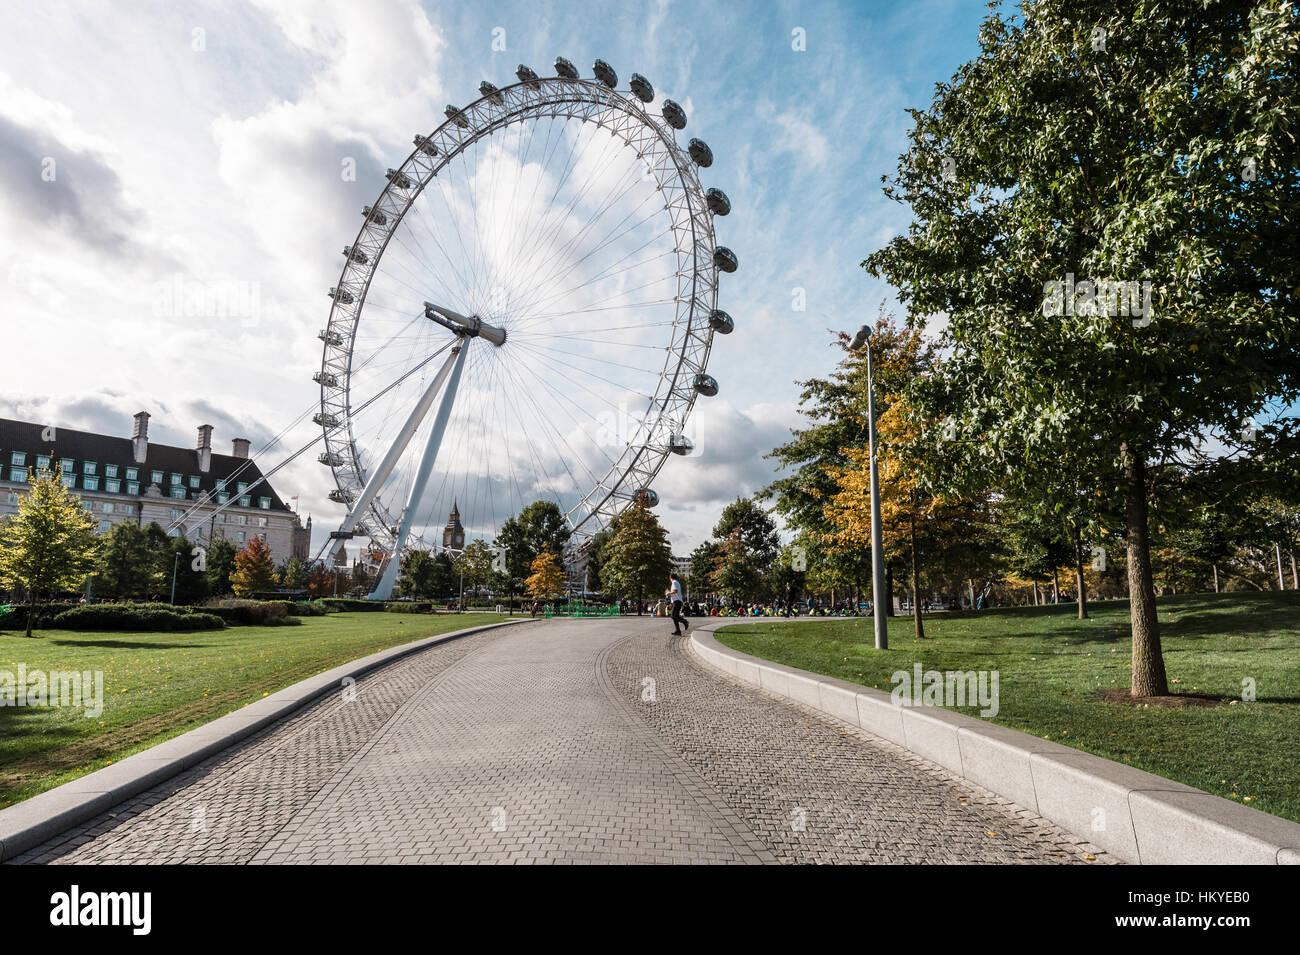 London, United Kingdom - October 18, 2016: London Eye ferris wheel in London, England Stock Photo